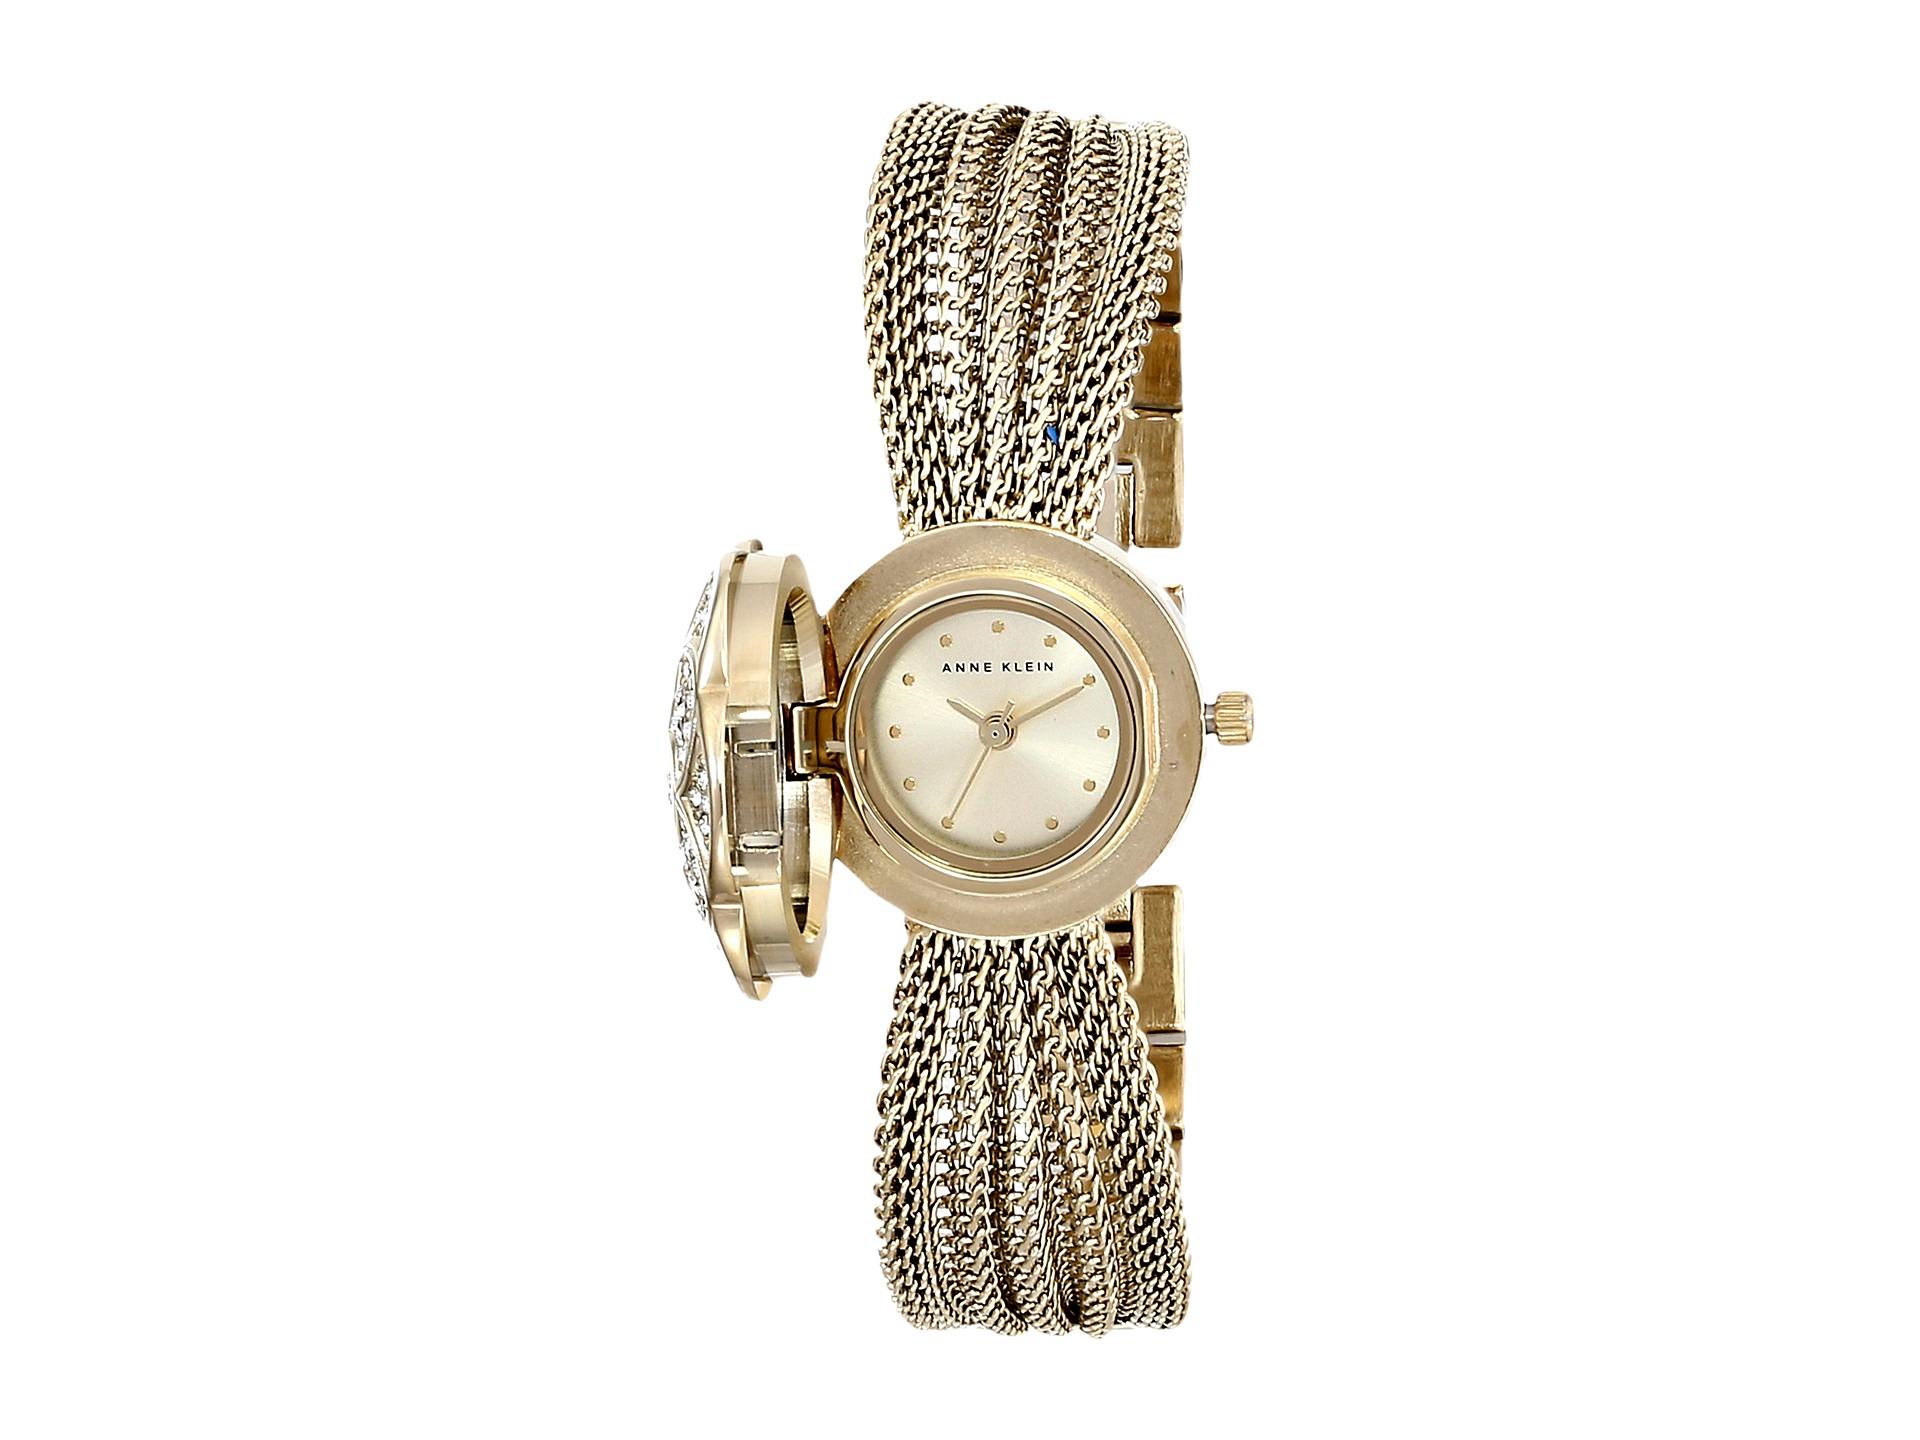 Anne klein ak 1046chcv swarovski crystal accented gold tone covered dial mesh bracelet watch in for Anne klein swarovski crystals